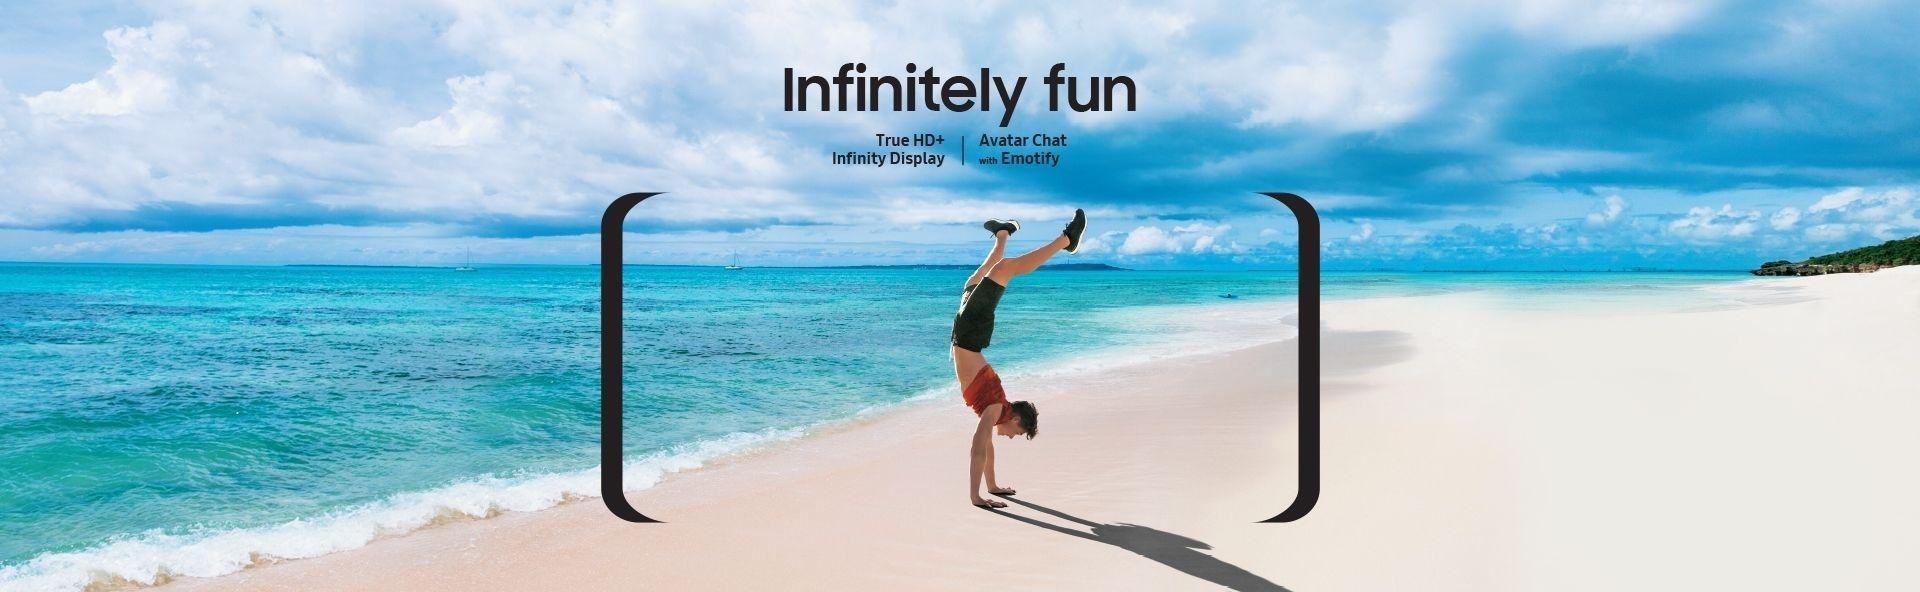 Infinitely Fun - Samsung Galaxy J4+